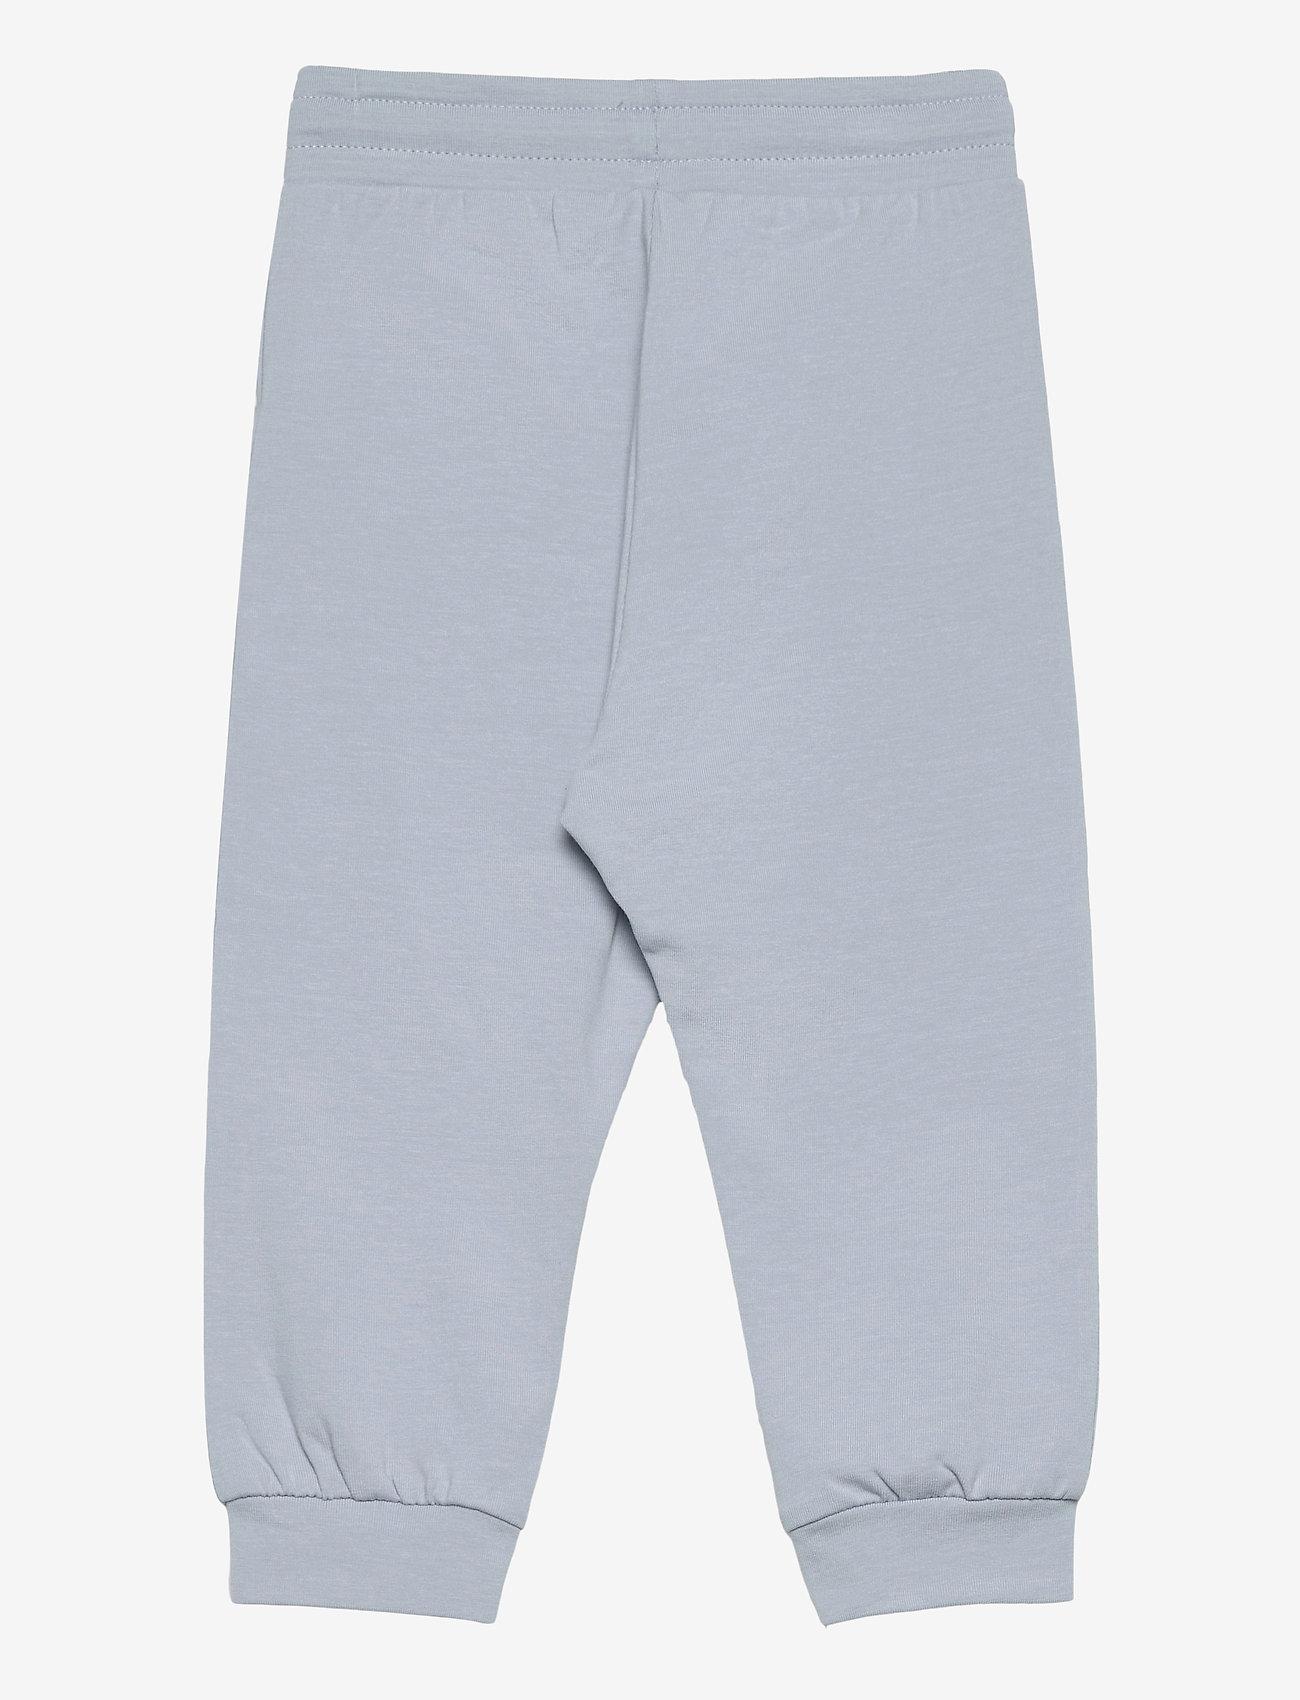 Hummel - hmlFUTTE PANTS - sweatpants - blue fog - 1